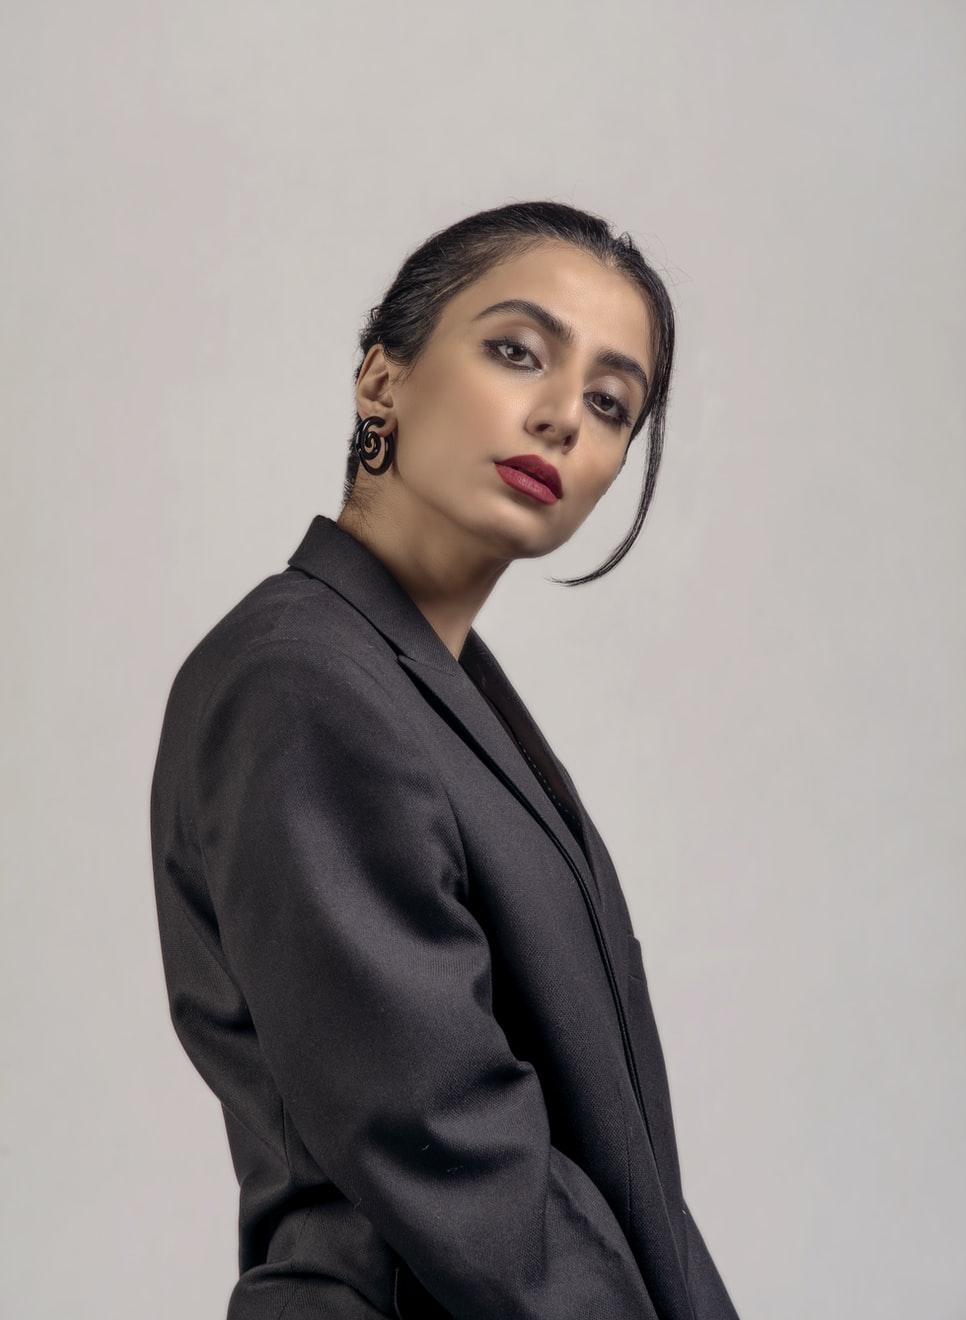 She goes from CEO to latex BIMBO